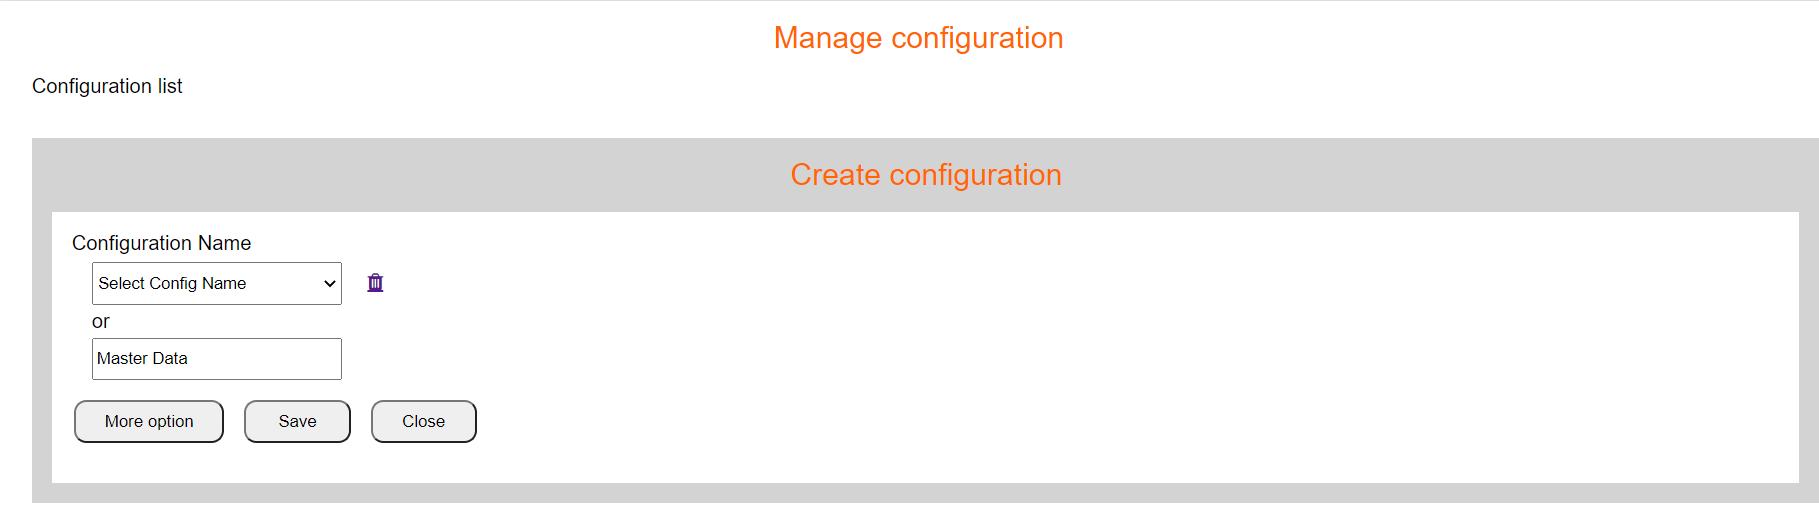 Add Configuration